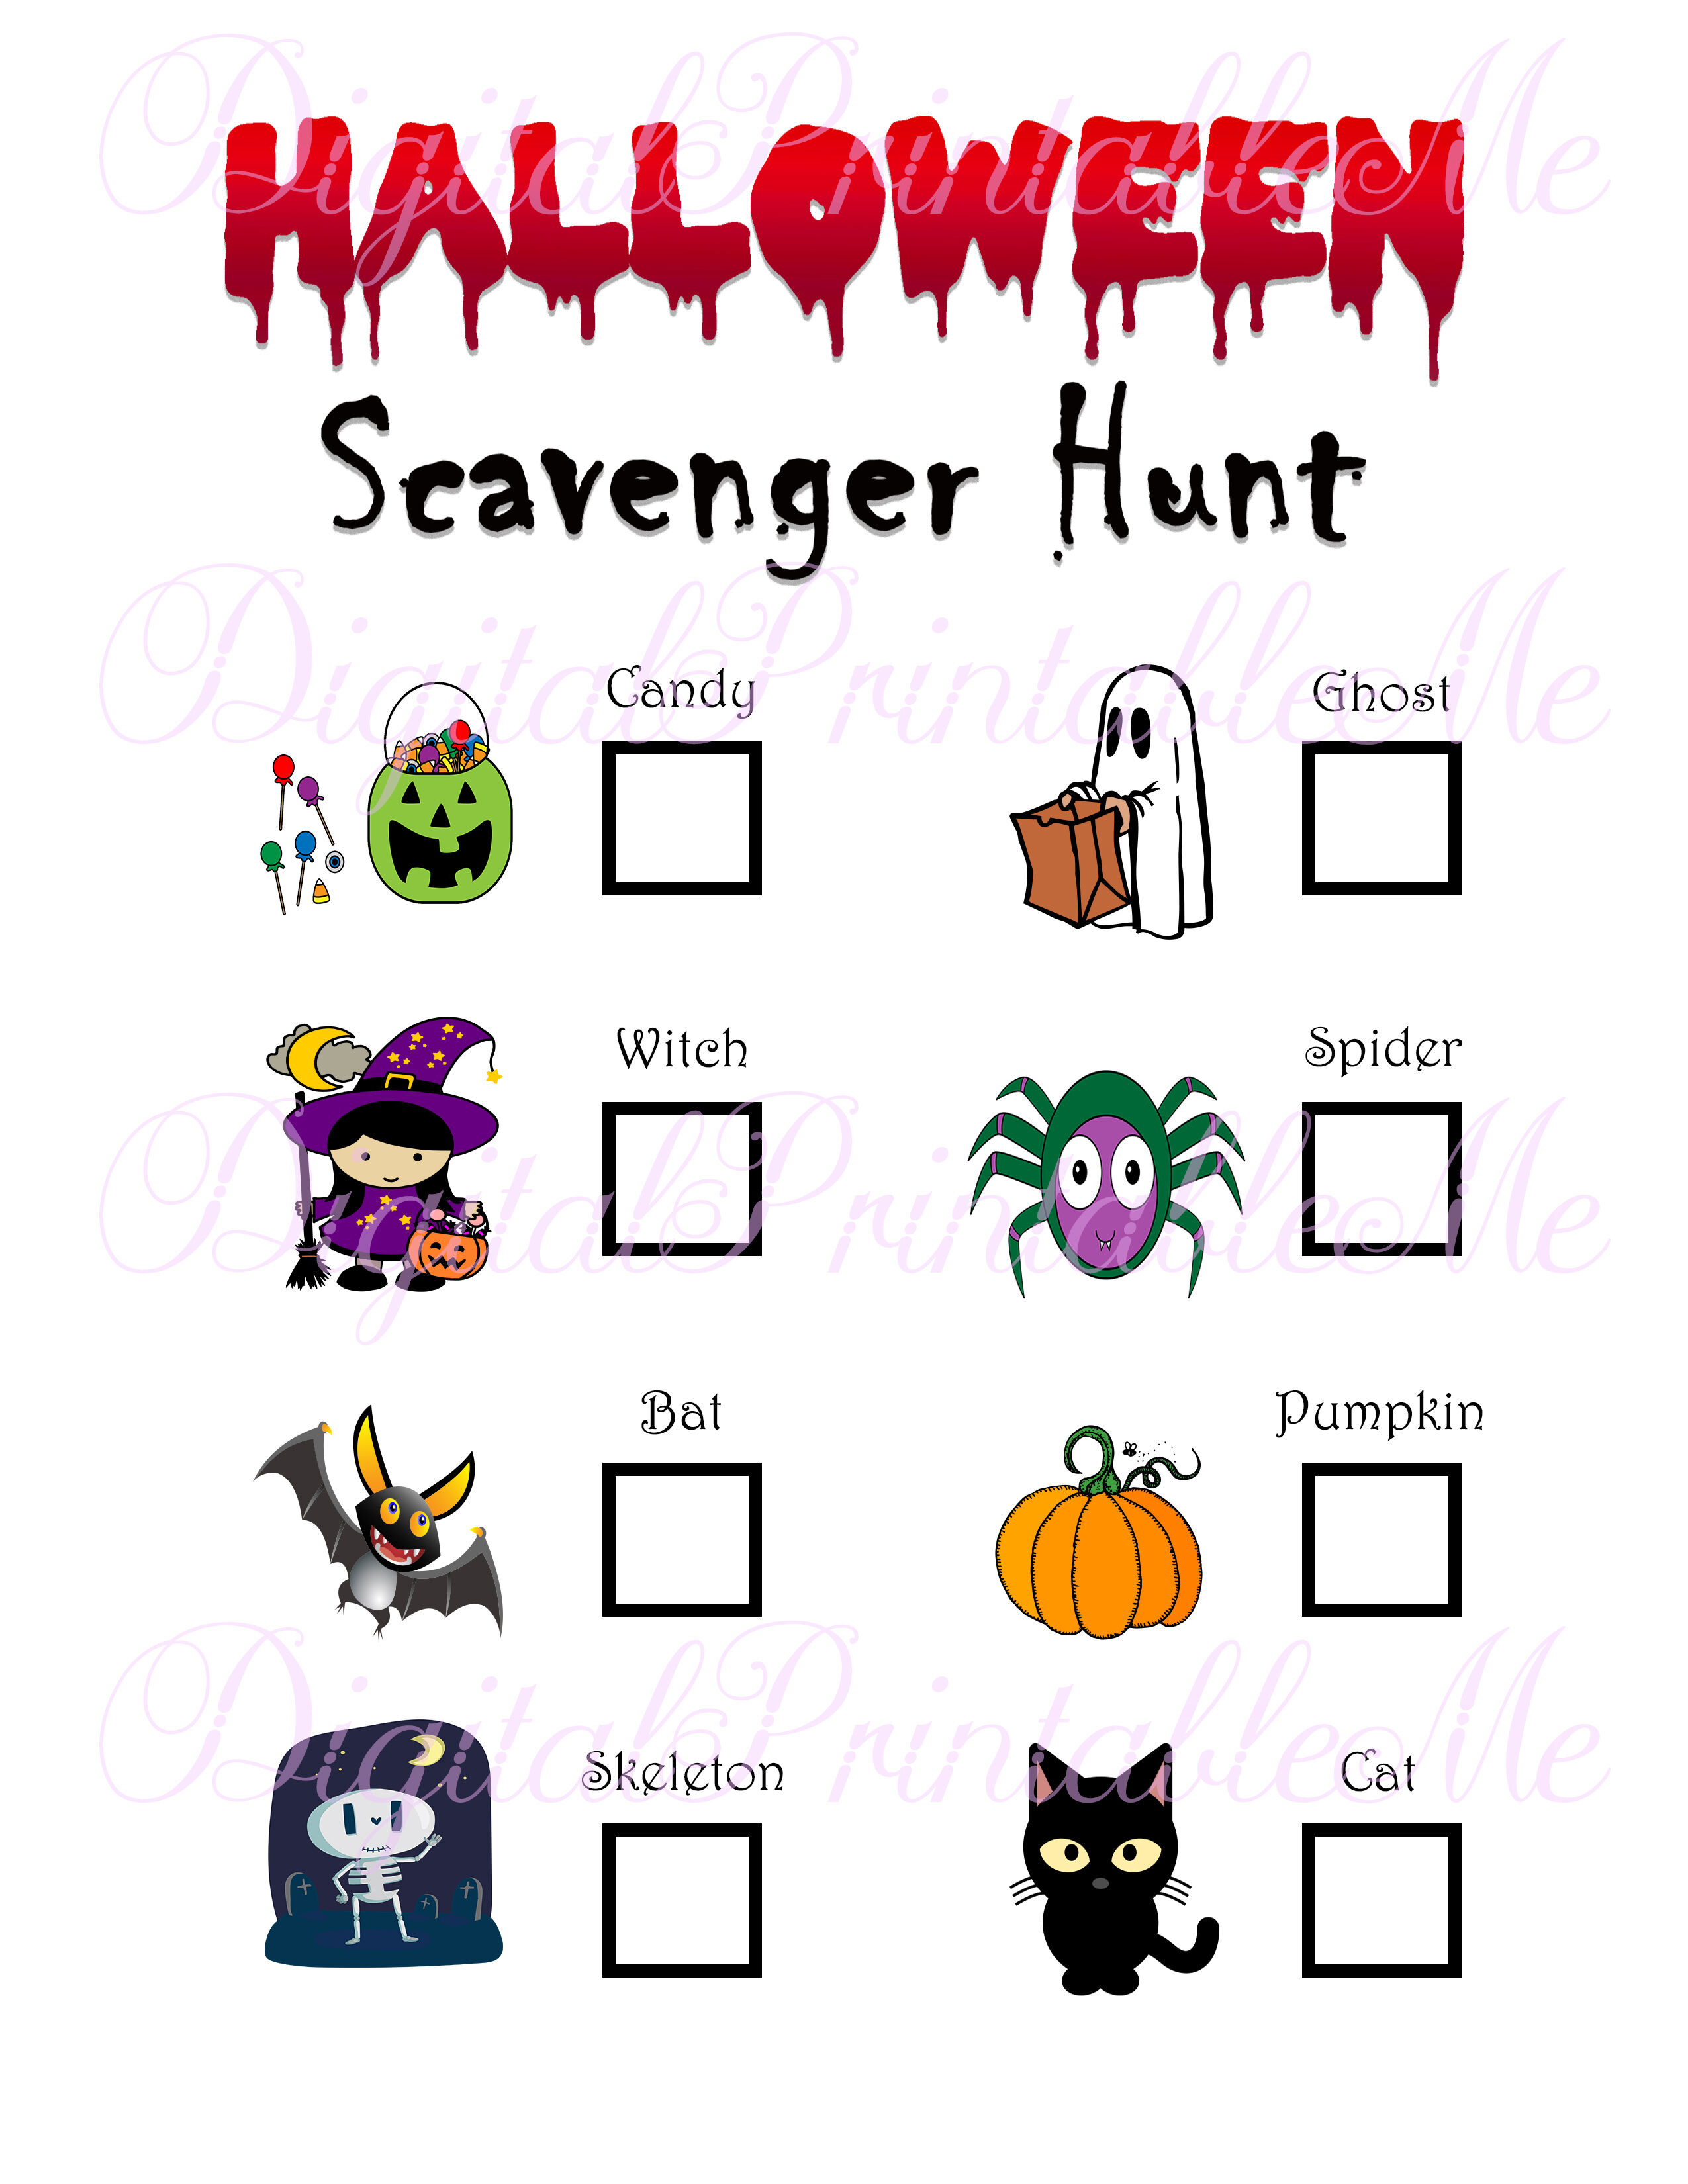 Halloween Scavenger Hunt Printable Kids Activity Backyard Game